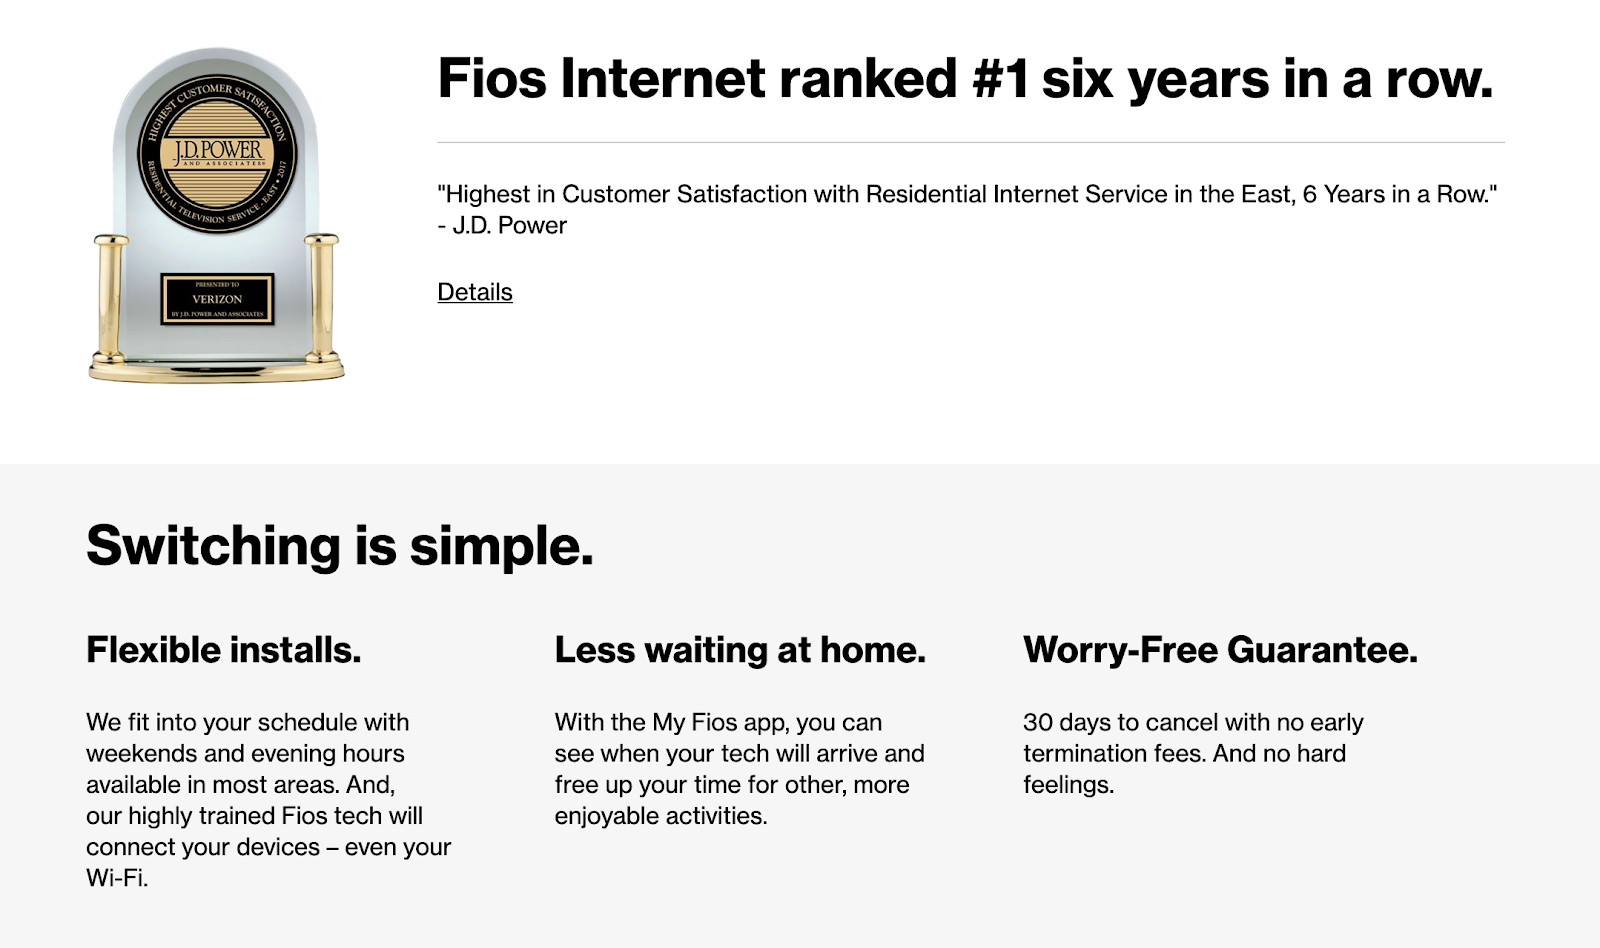 Best Internet Providers of 2019